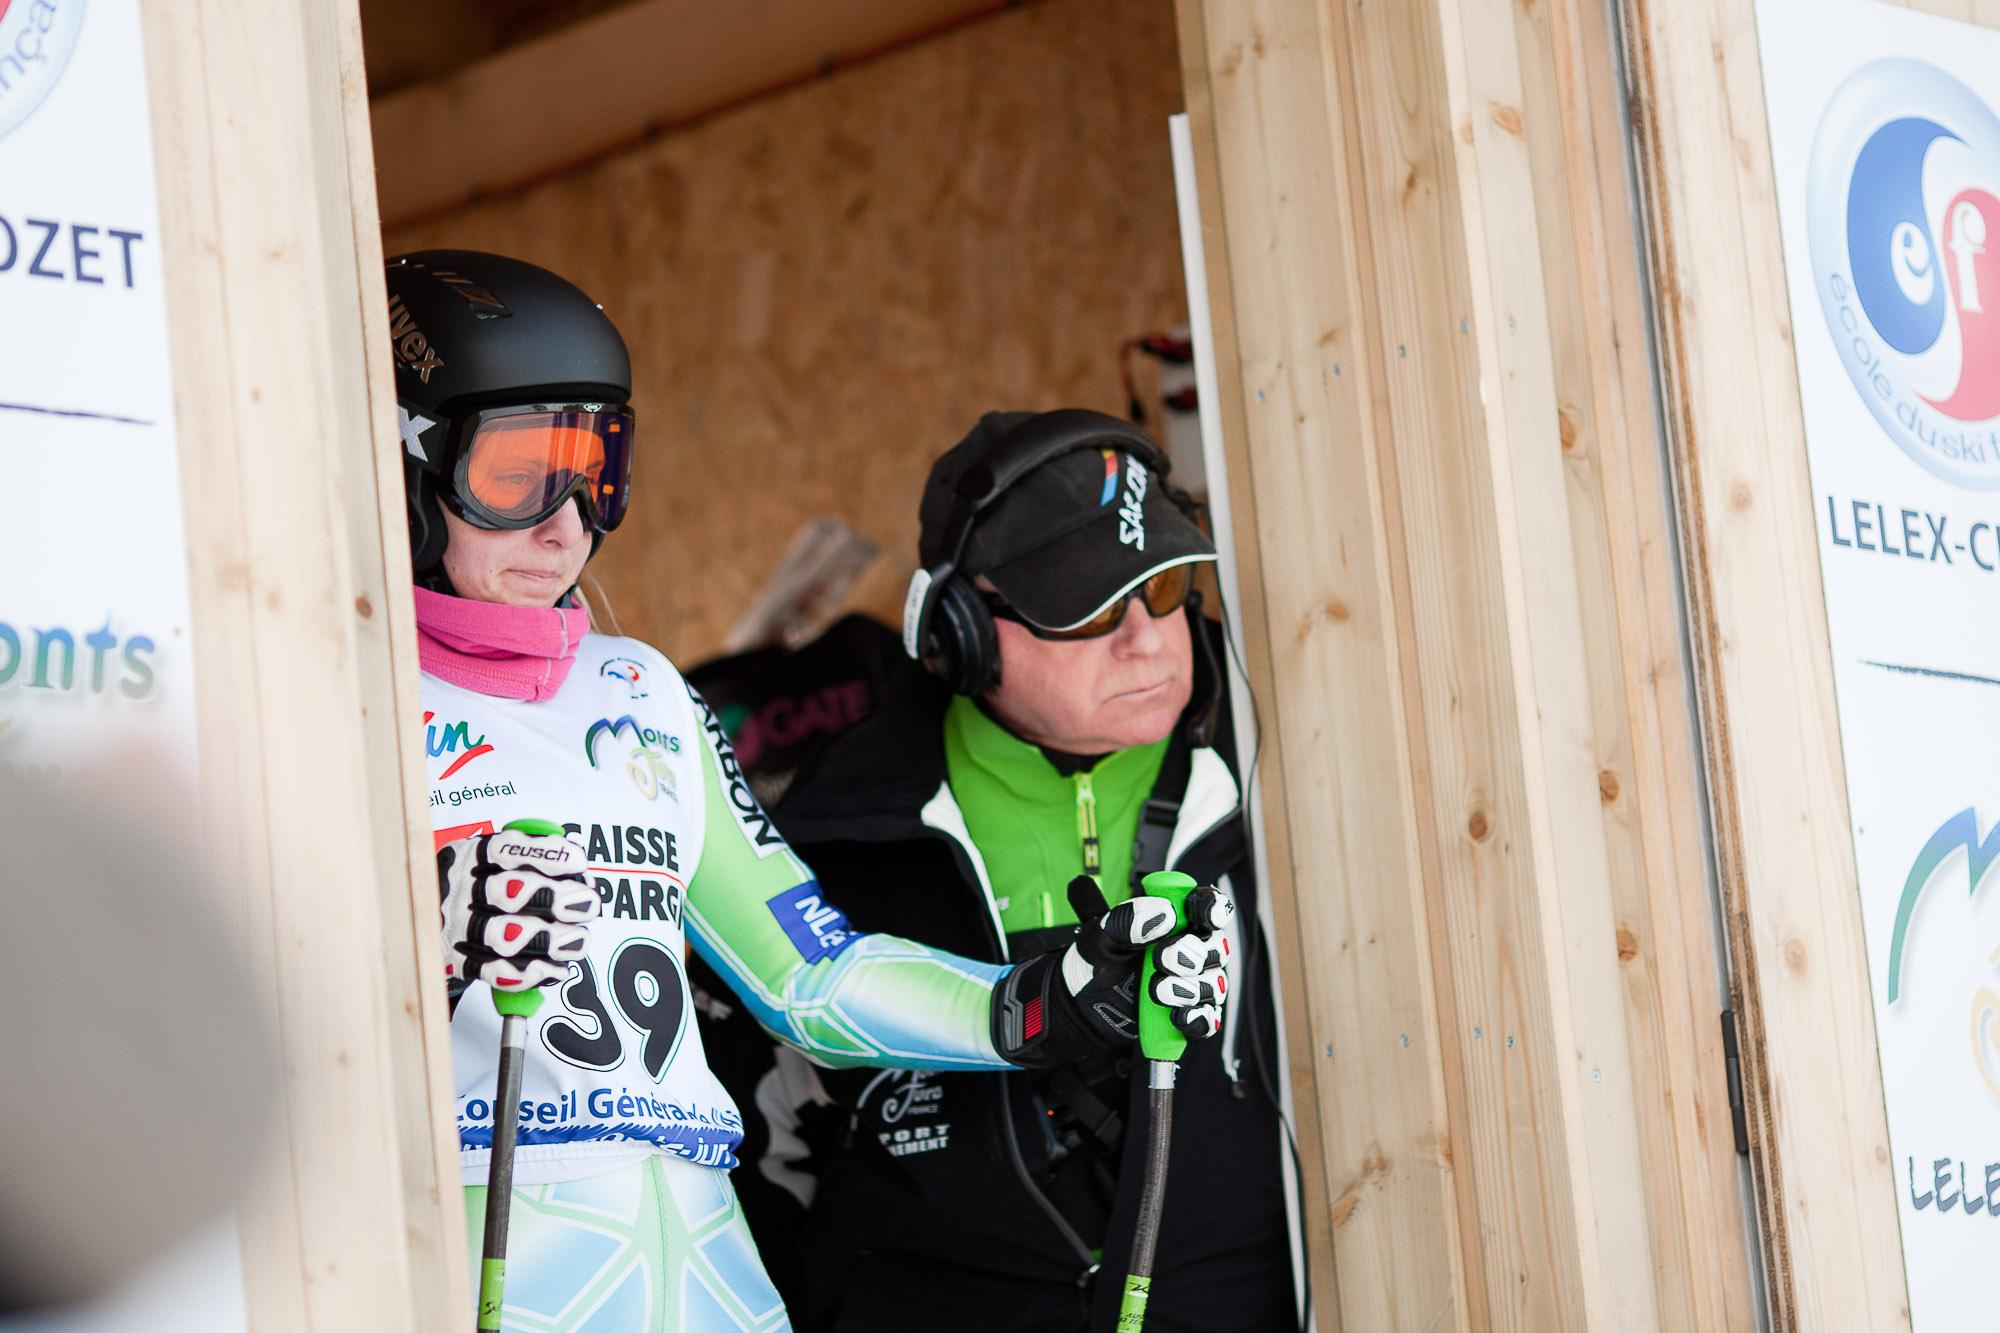 Coupe_Europe_ski_dames-261.jpg